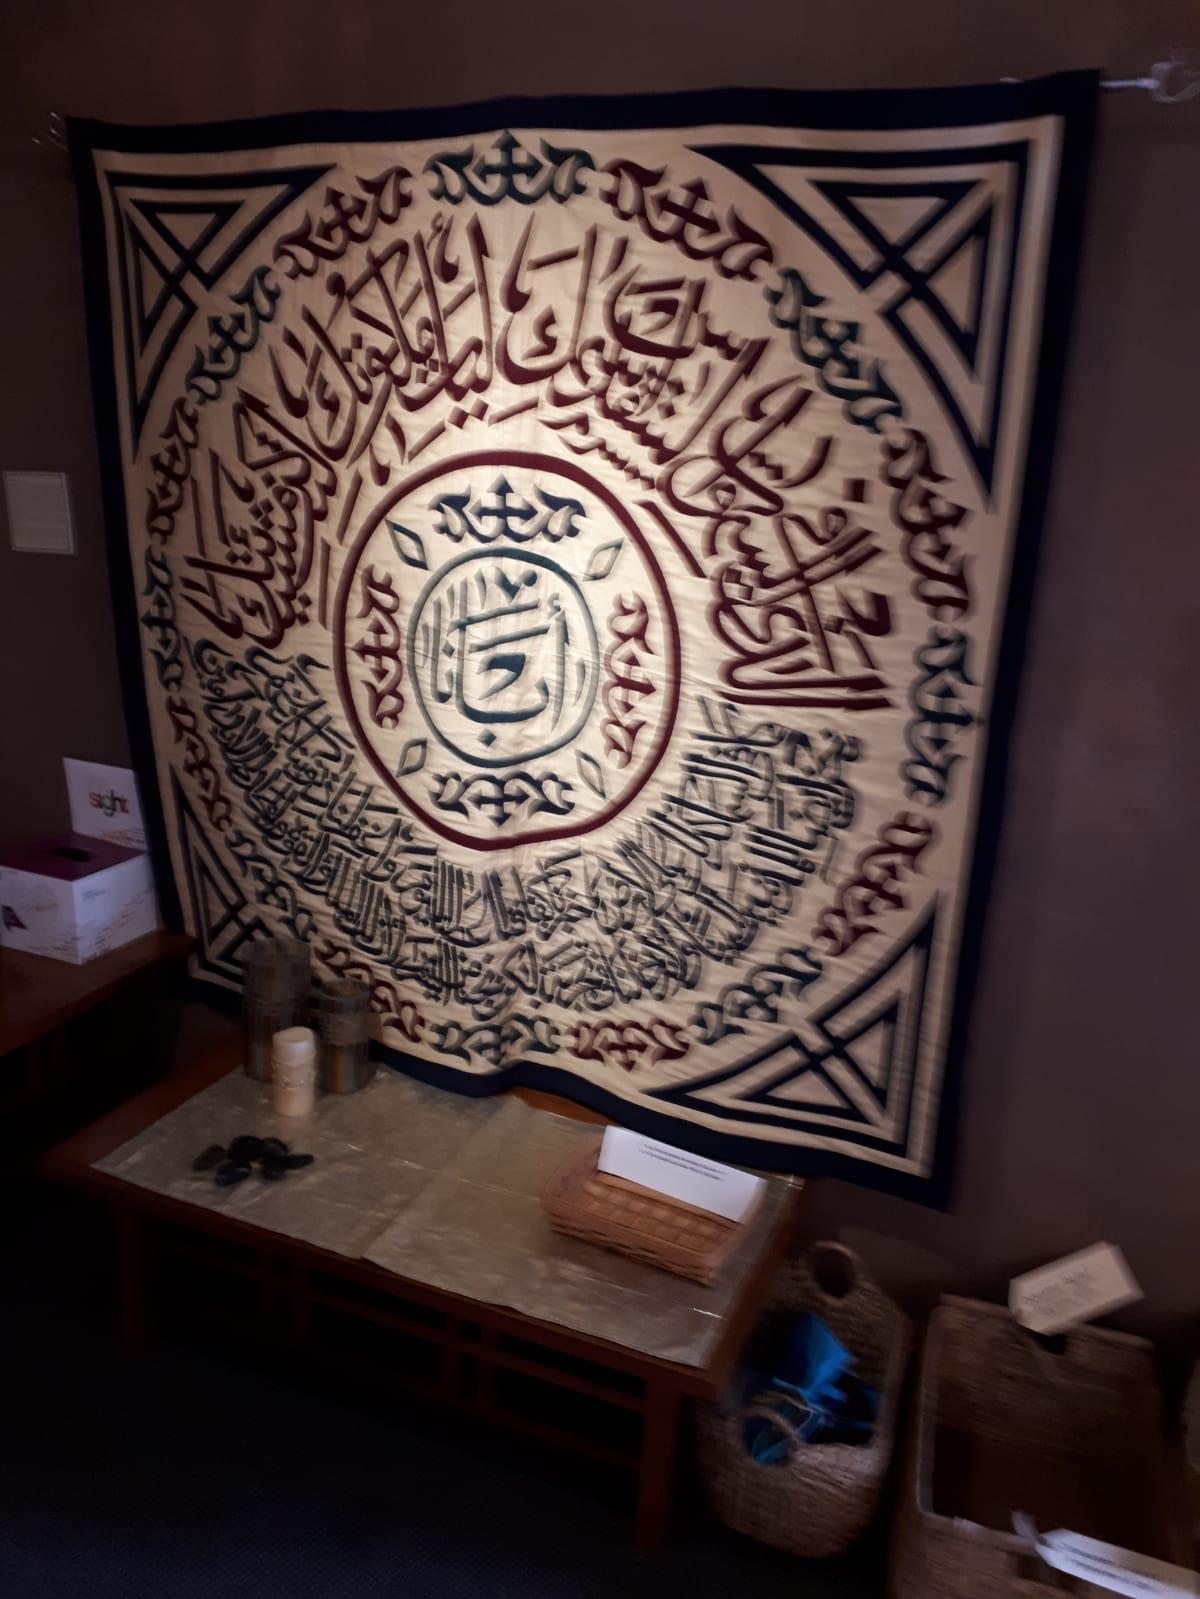 Lord's Prayer in Arabic